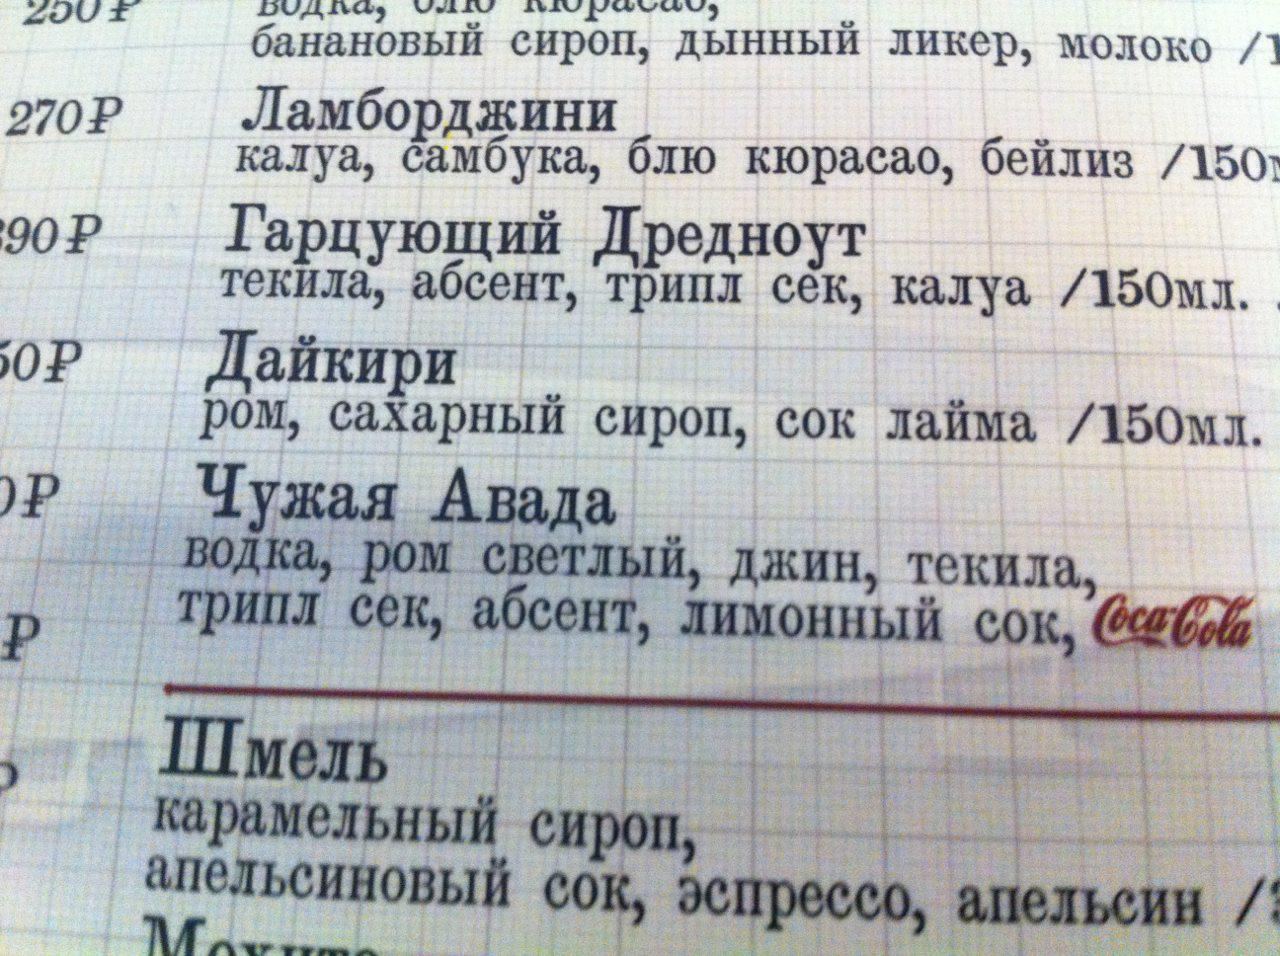 http://s7.uploads.ru/MnIeH.jpg